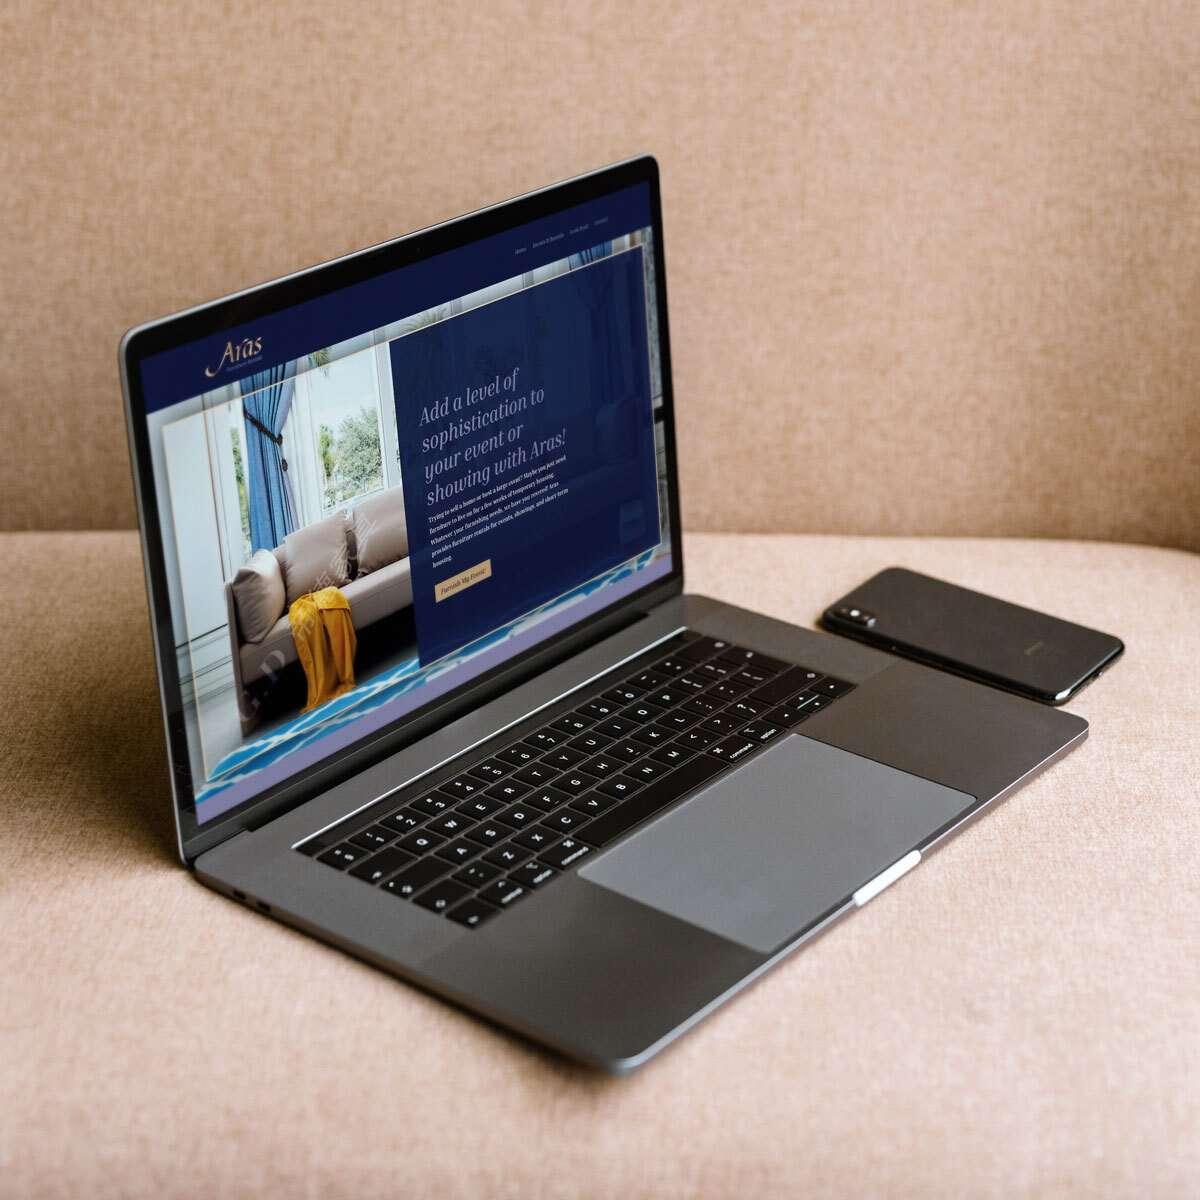 Aras Web Design by BrandSwan, a web design company